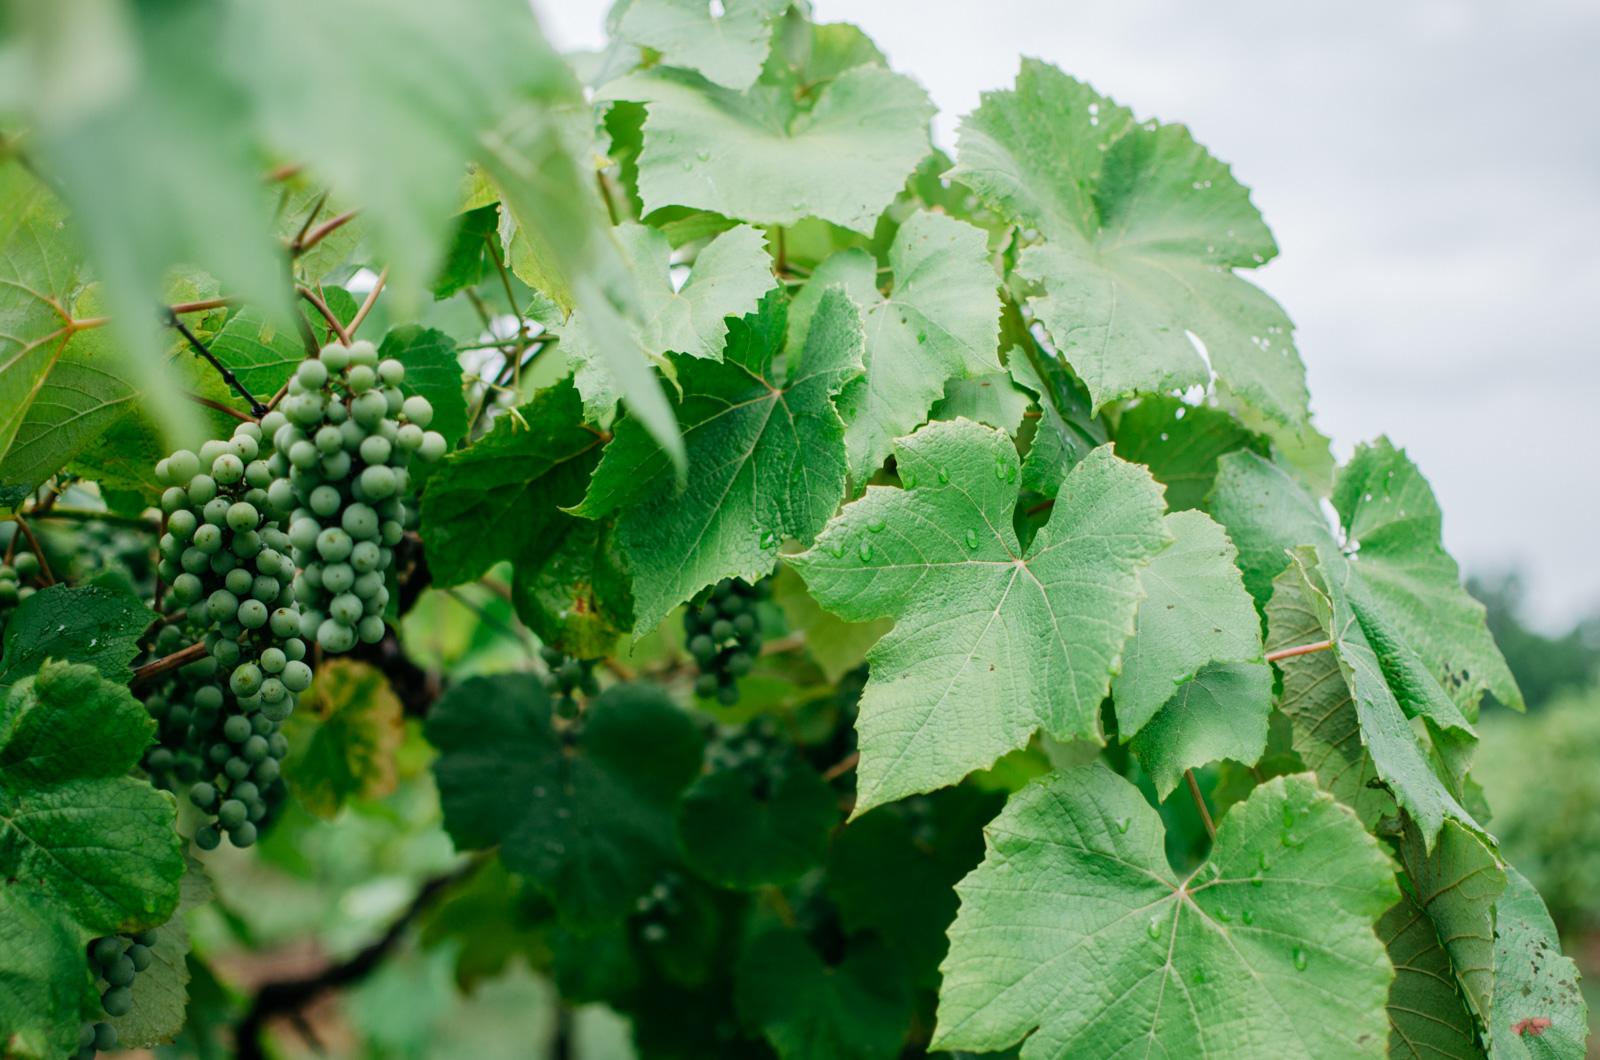 richmond winery - richmond virginia blogger   bylaurenm.com